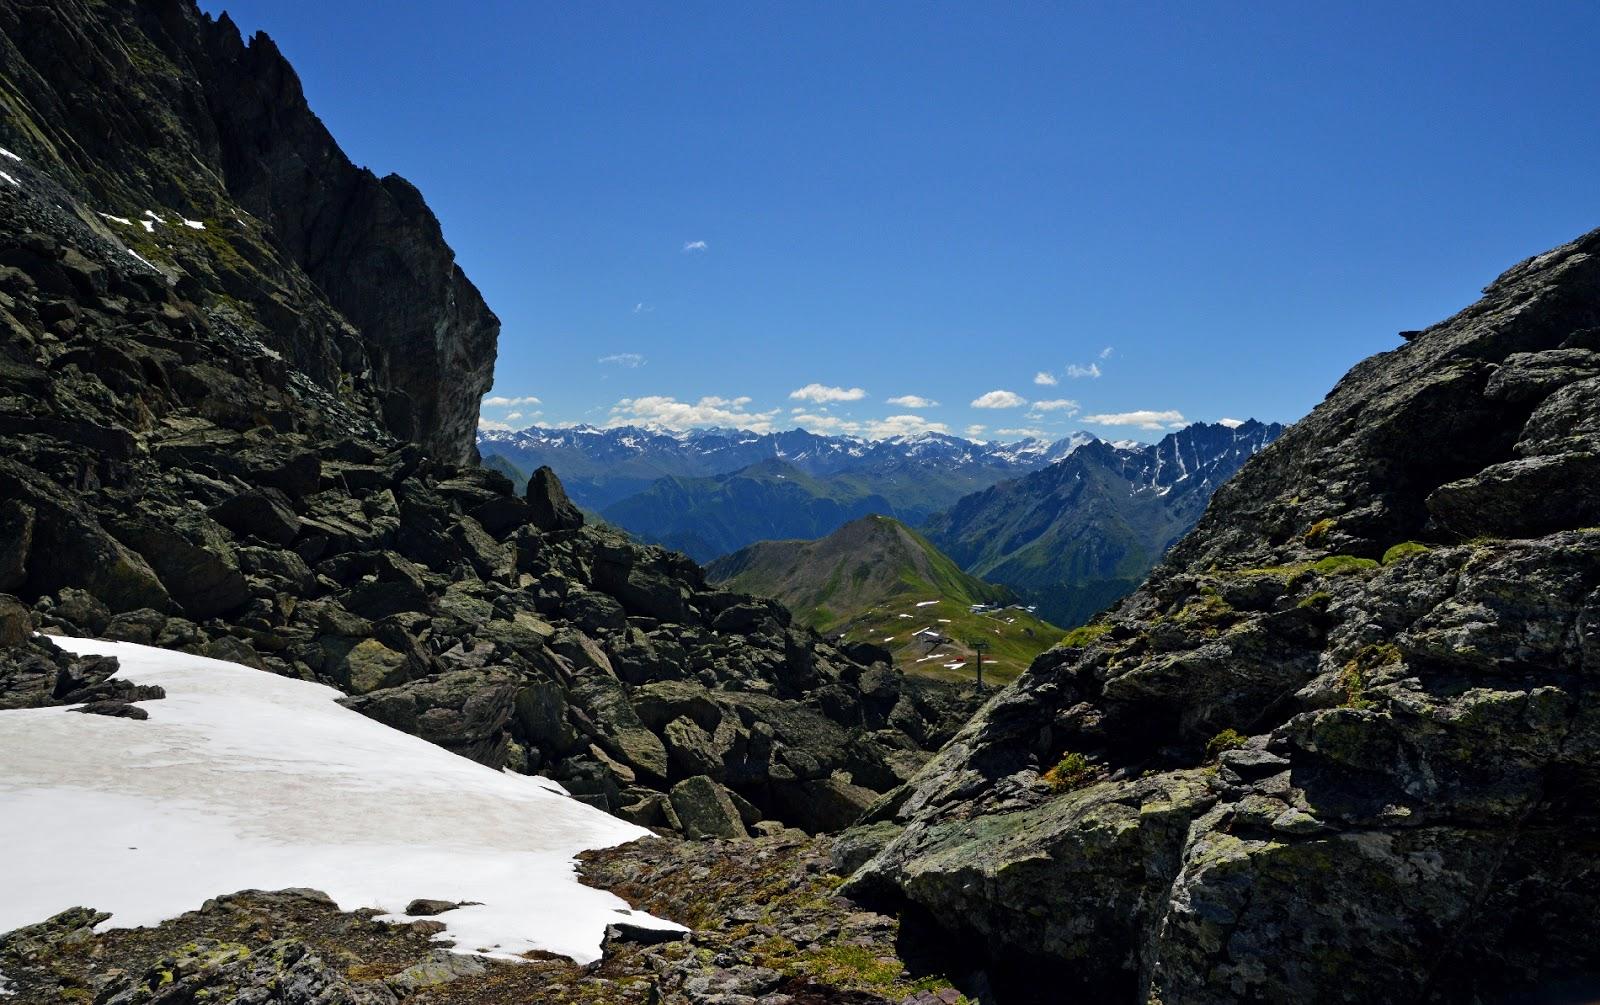 Alpy Tyrol Ischgl Samnaun